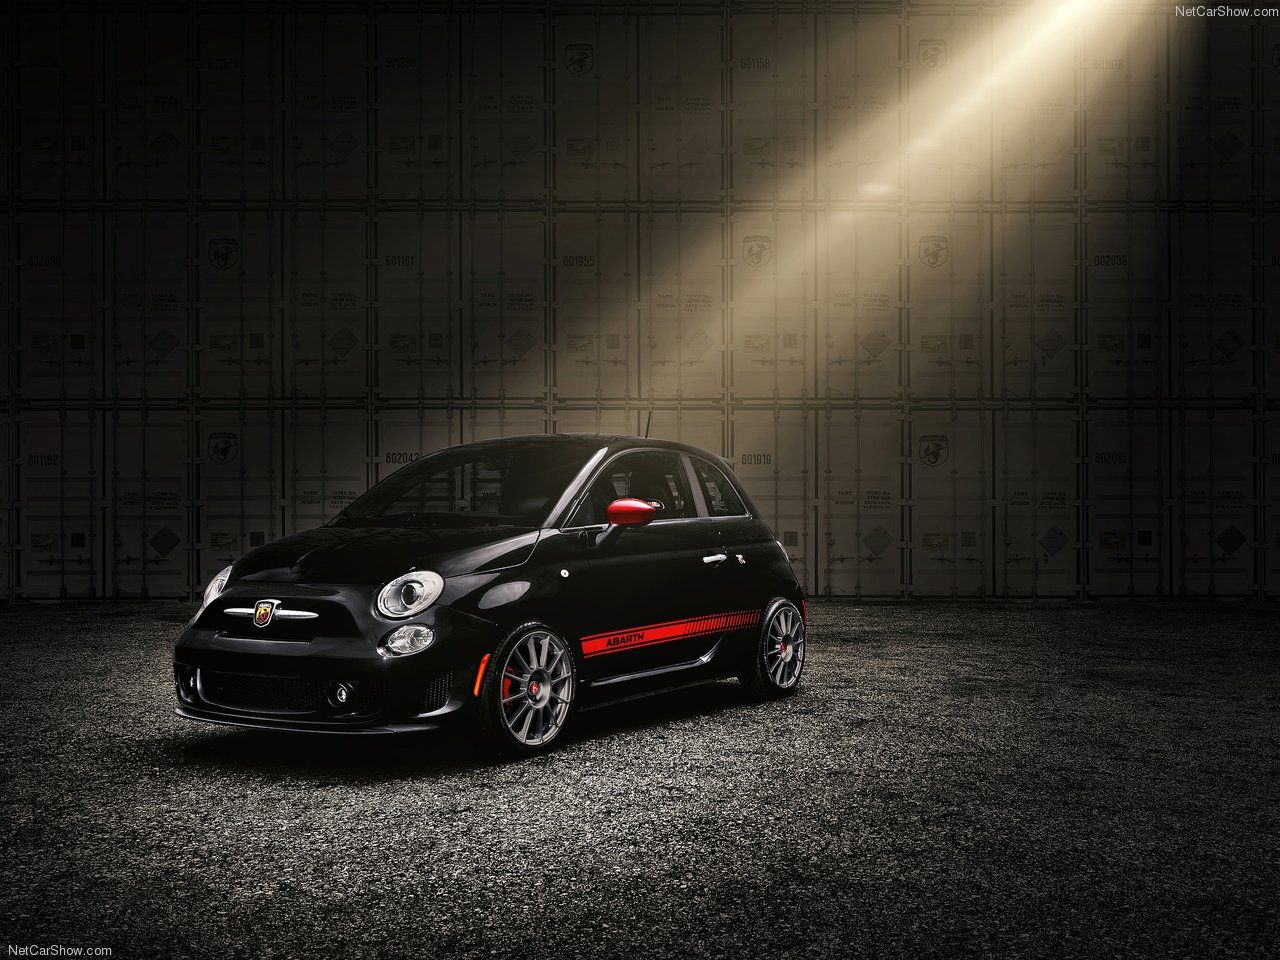 Abarth 500 Scorpion Black Car, Car wheels rims, Fiat 500